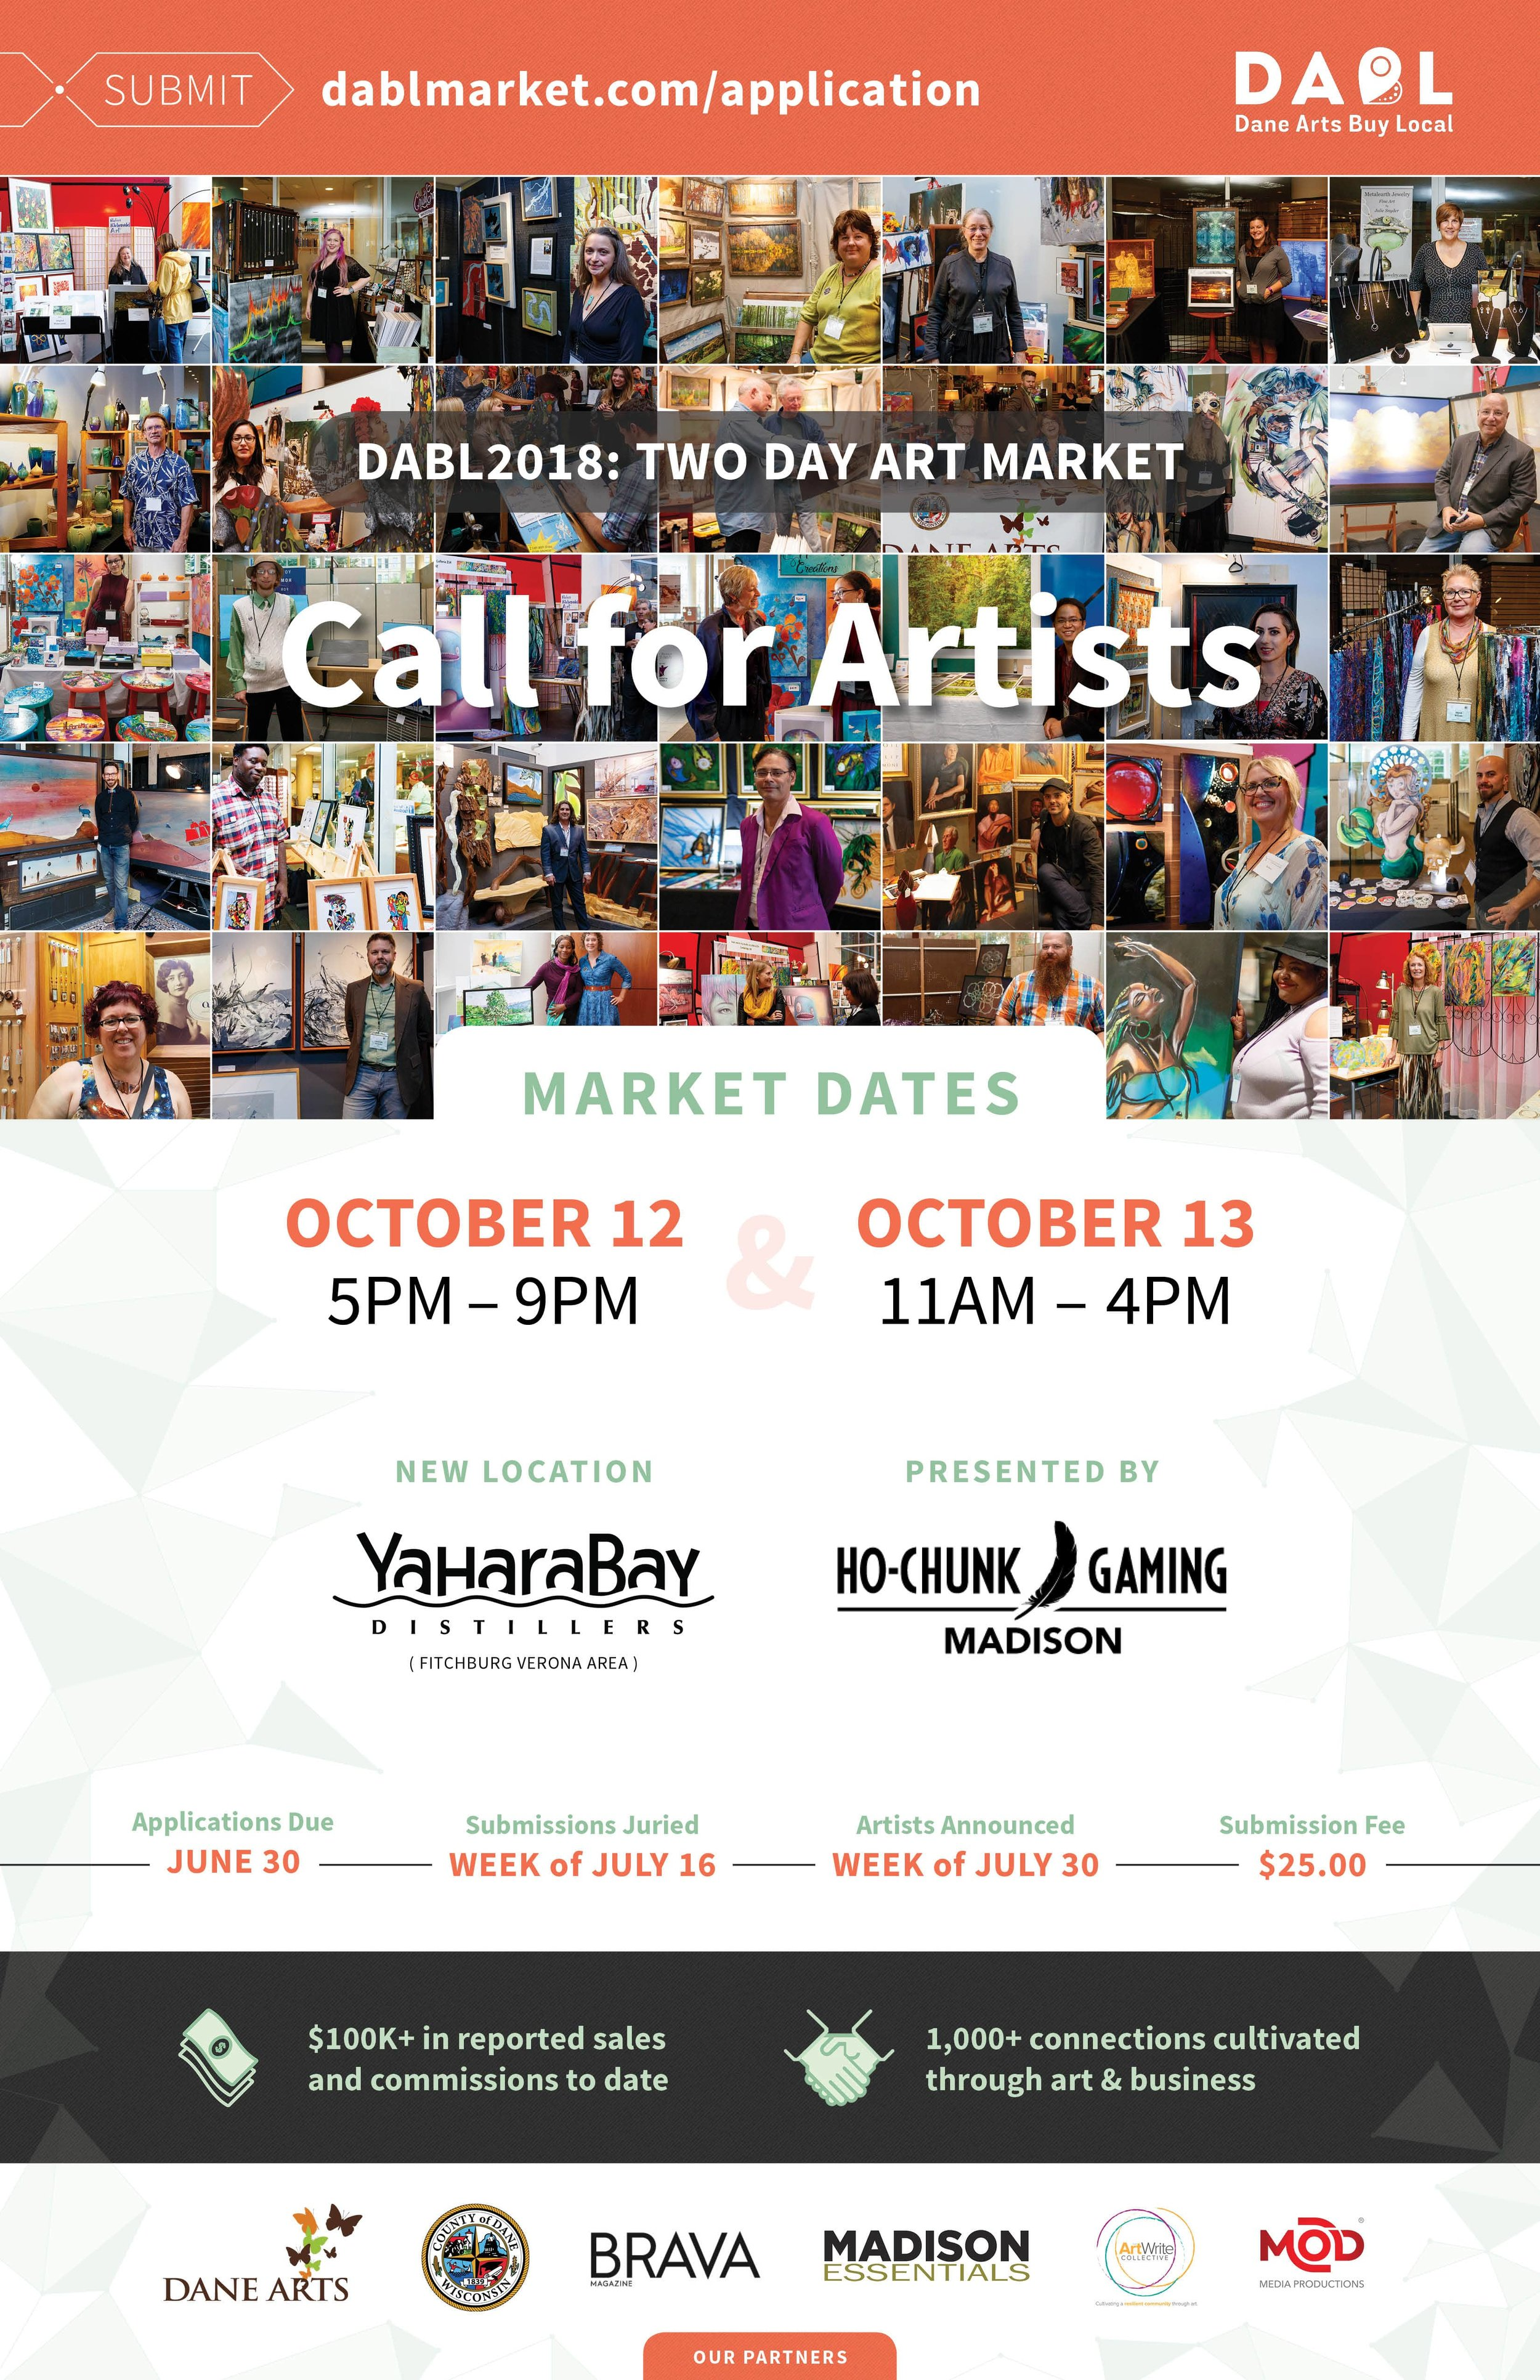 Dane-Arts-Buy-Local-2018-poster-min.jpg